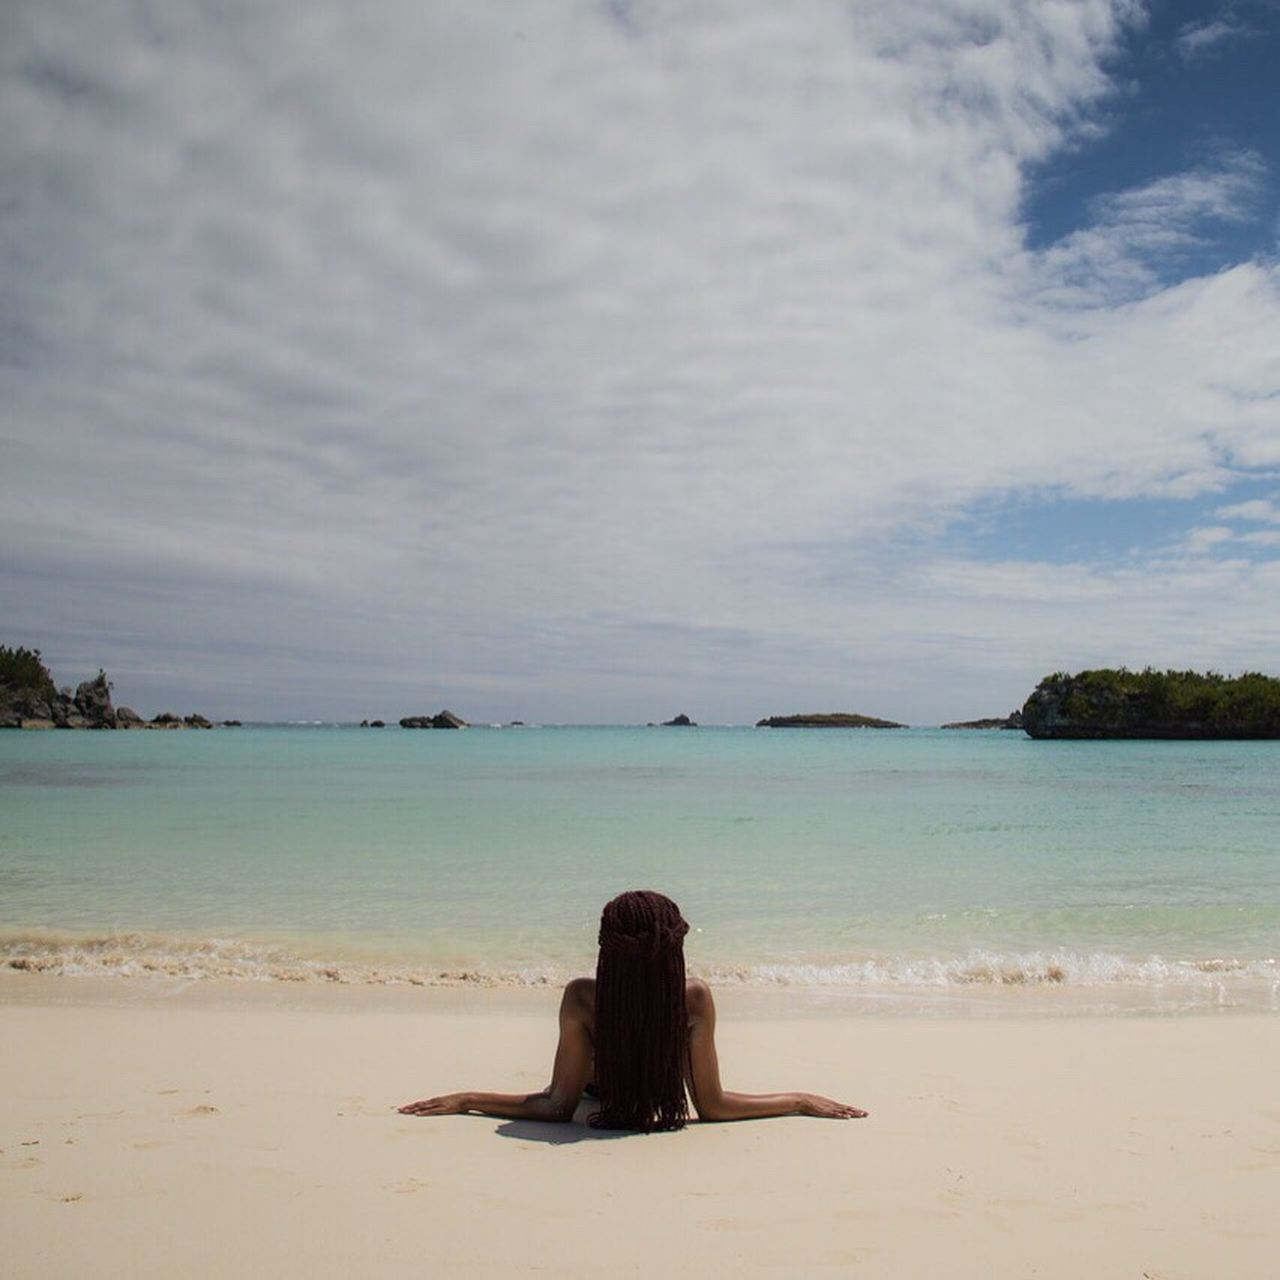 Mermaids on the beach at Coopers Island, Bermuda